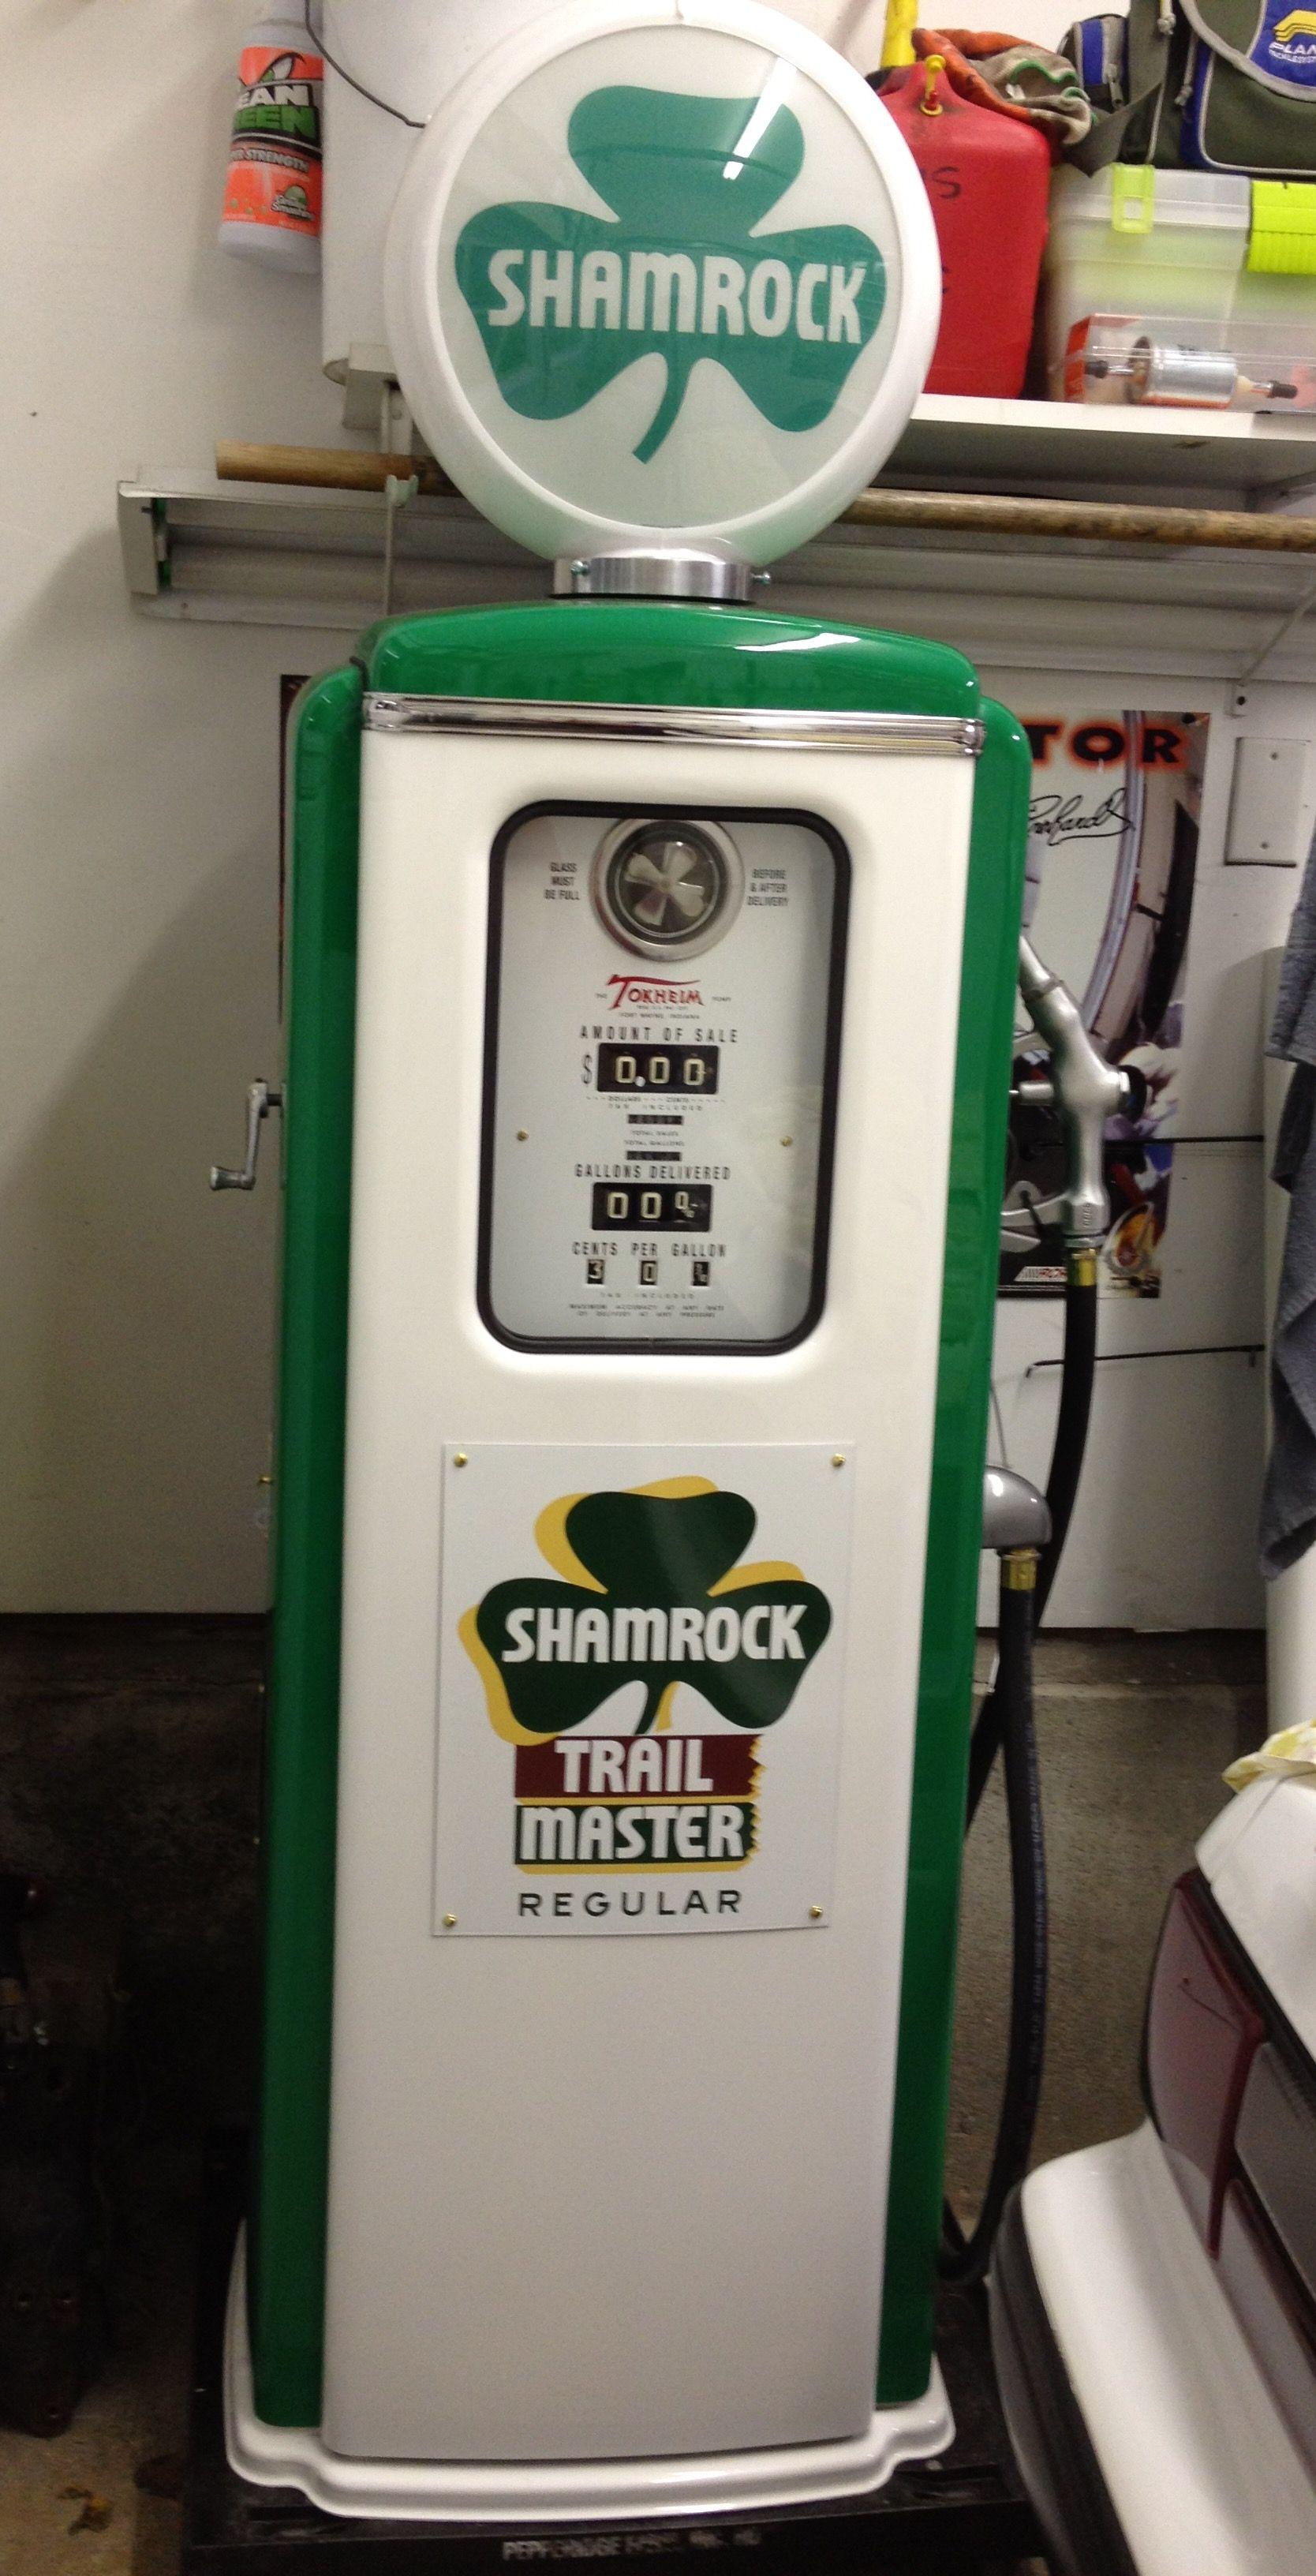 1940 50 S Tokheim Shamrock Gas Pump Vintage Gas Pumps Old Gas Pumps Gas Pumps